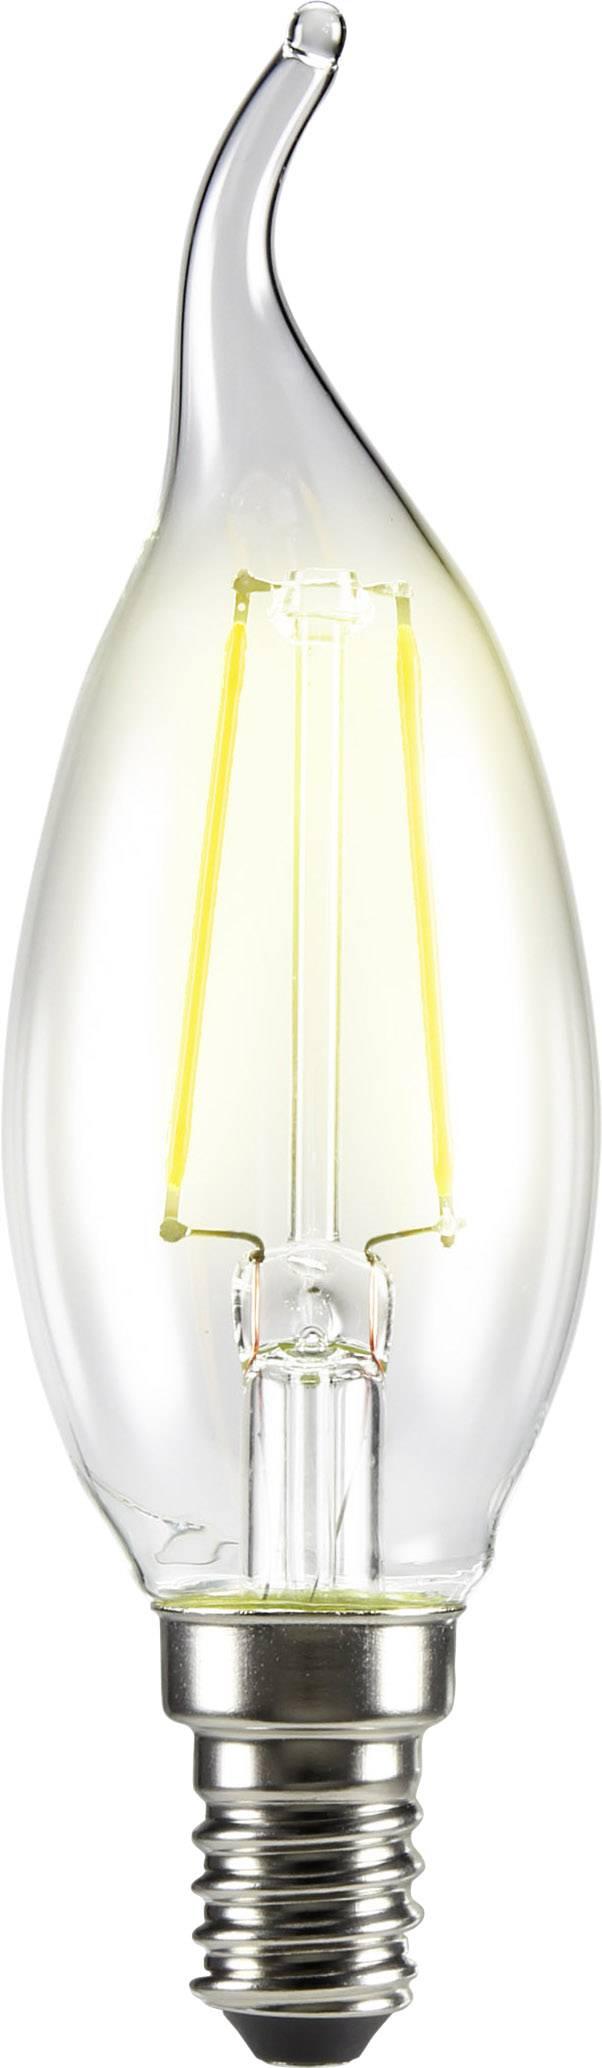 LED žiarovka 120 mm sygonix 230 V 2 W = 25 W vlákno 1 ks